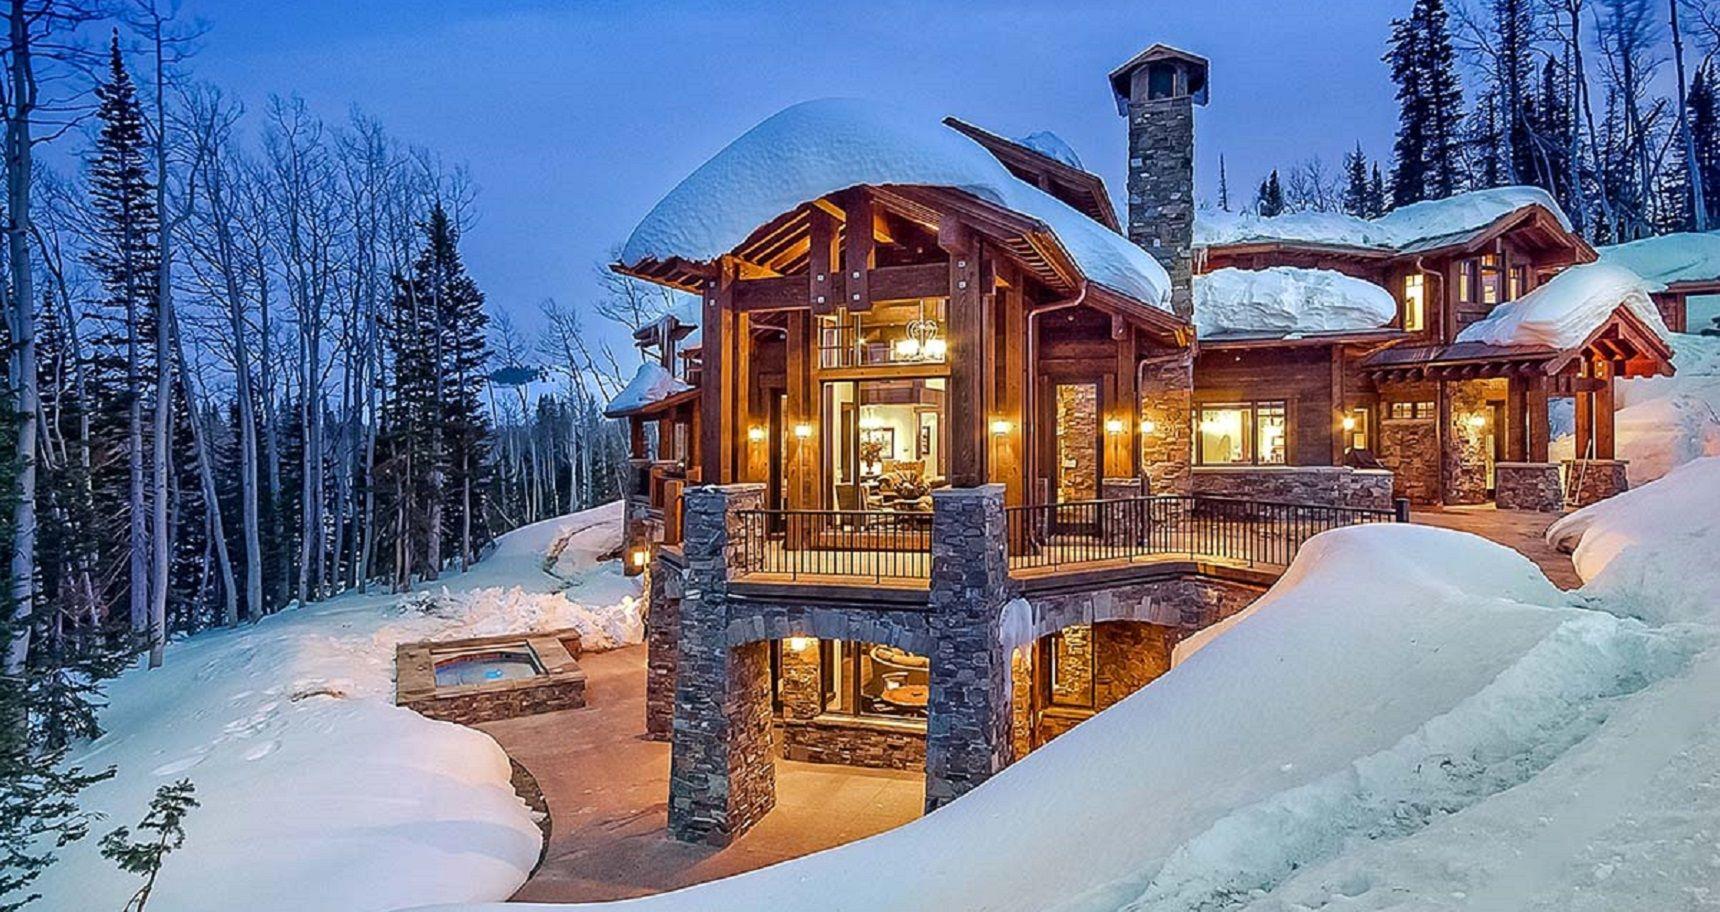 Hotel in Victoria, BC | The Westin Bear Mountain Golf